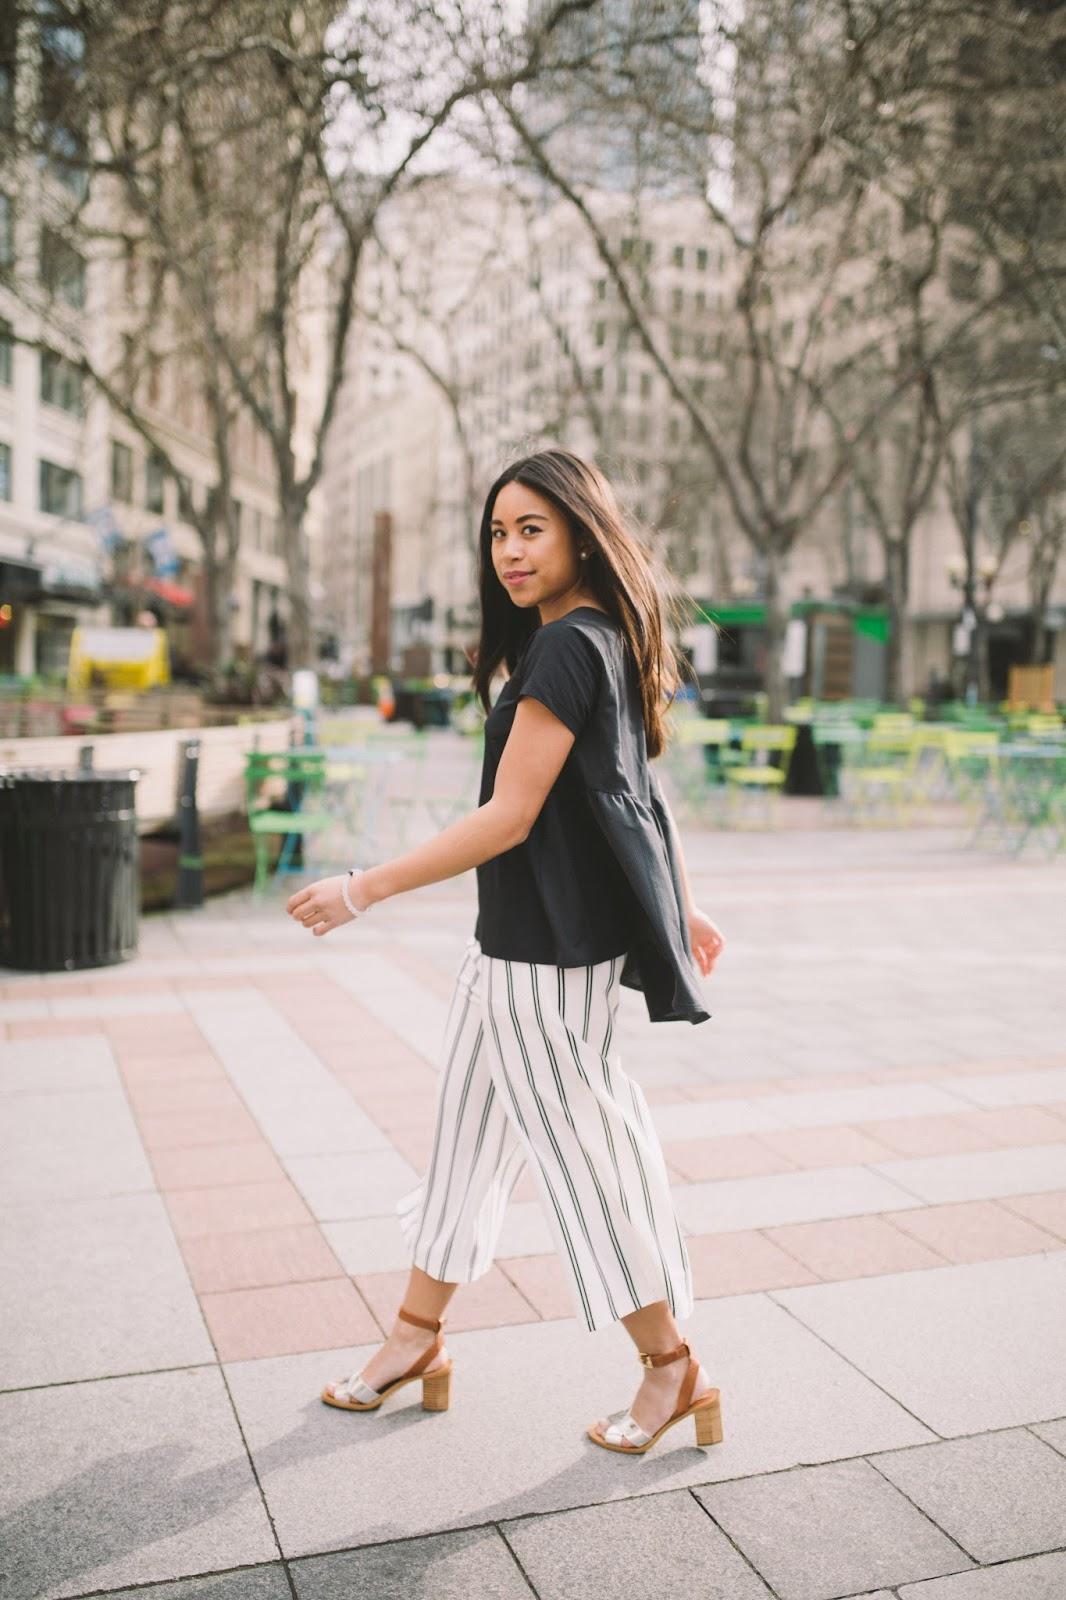 How to Pose like a Fashion Blogger: 12 Ideas You Should ...